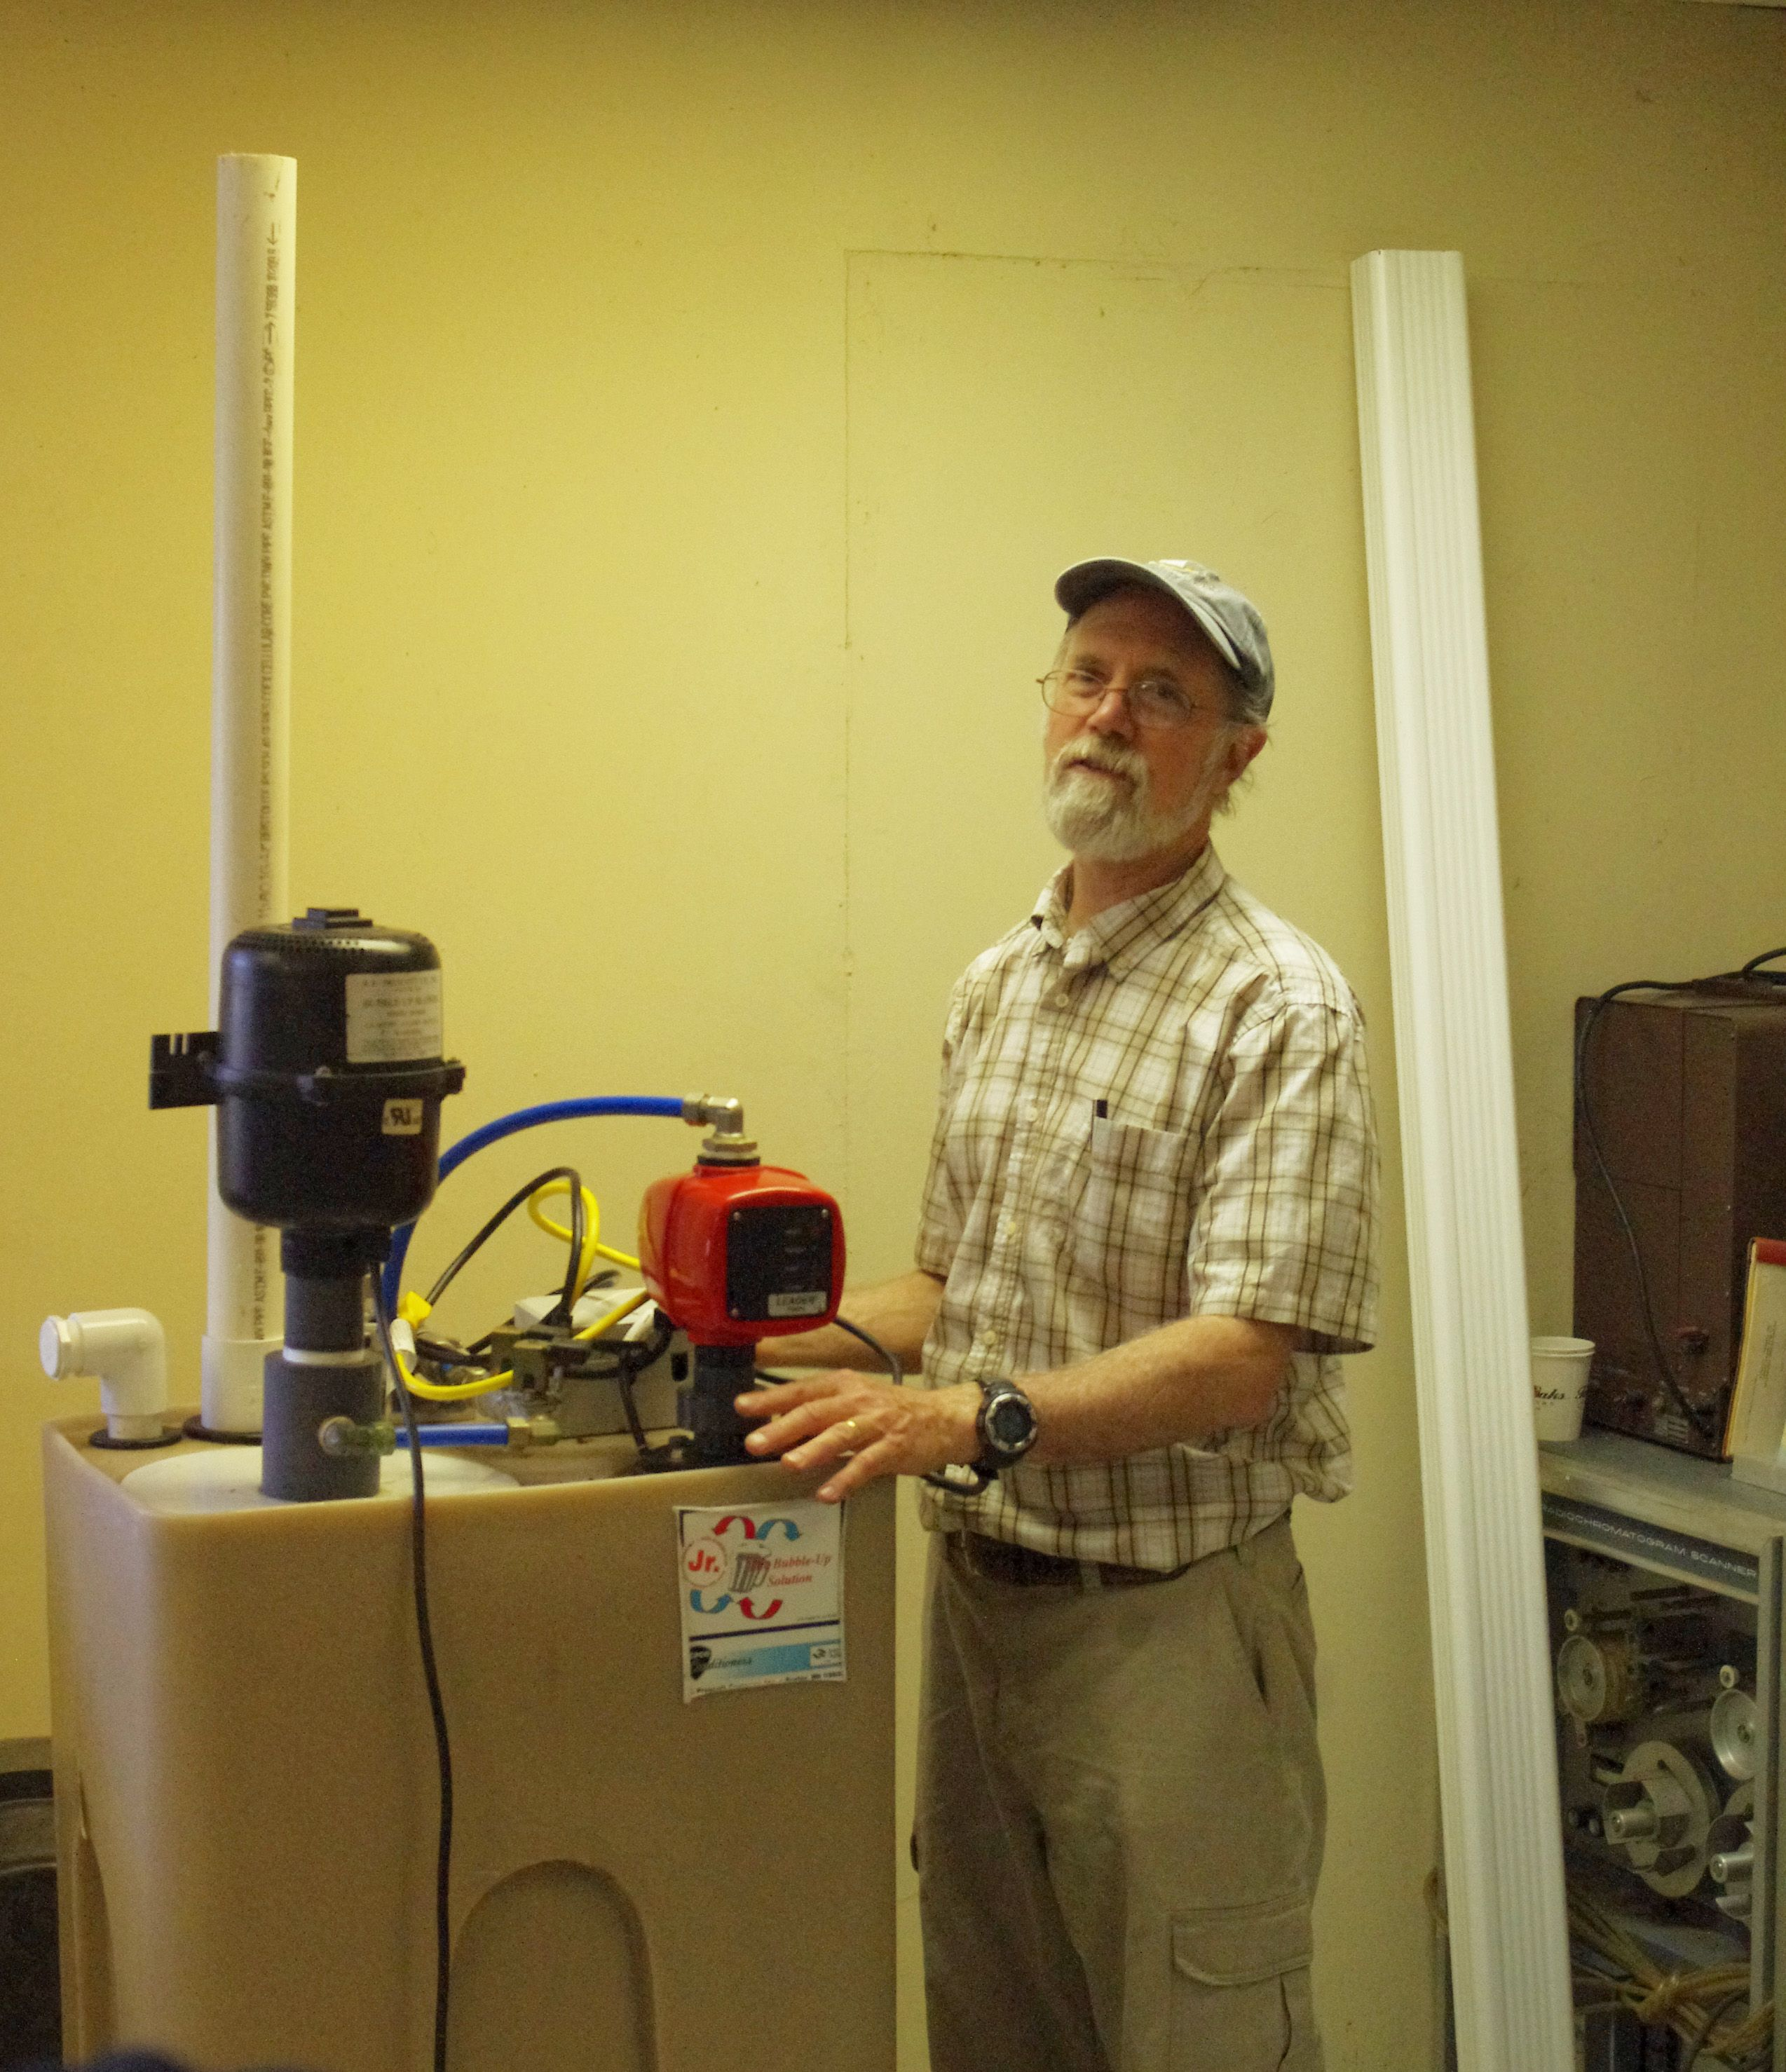 Radon Mitigation System Tools At Rutgers Radon Mitgation Course Radon Radonmeasurement Radonmitigation Nrpp Nrsb Indoor Air Quality Indoor Air Air Quality